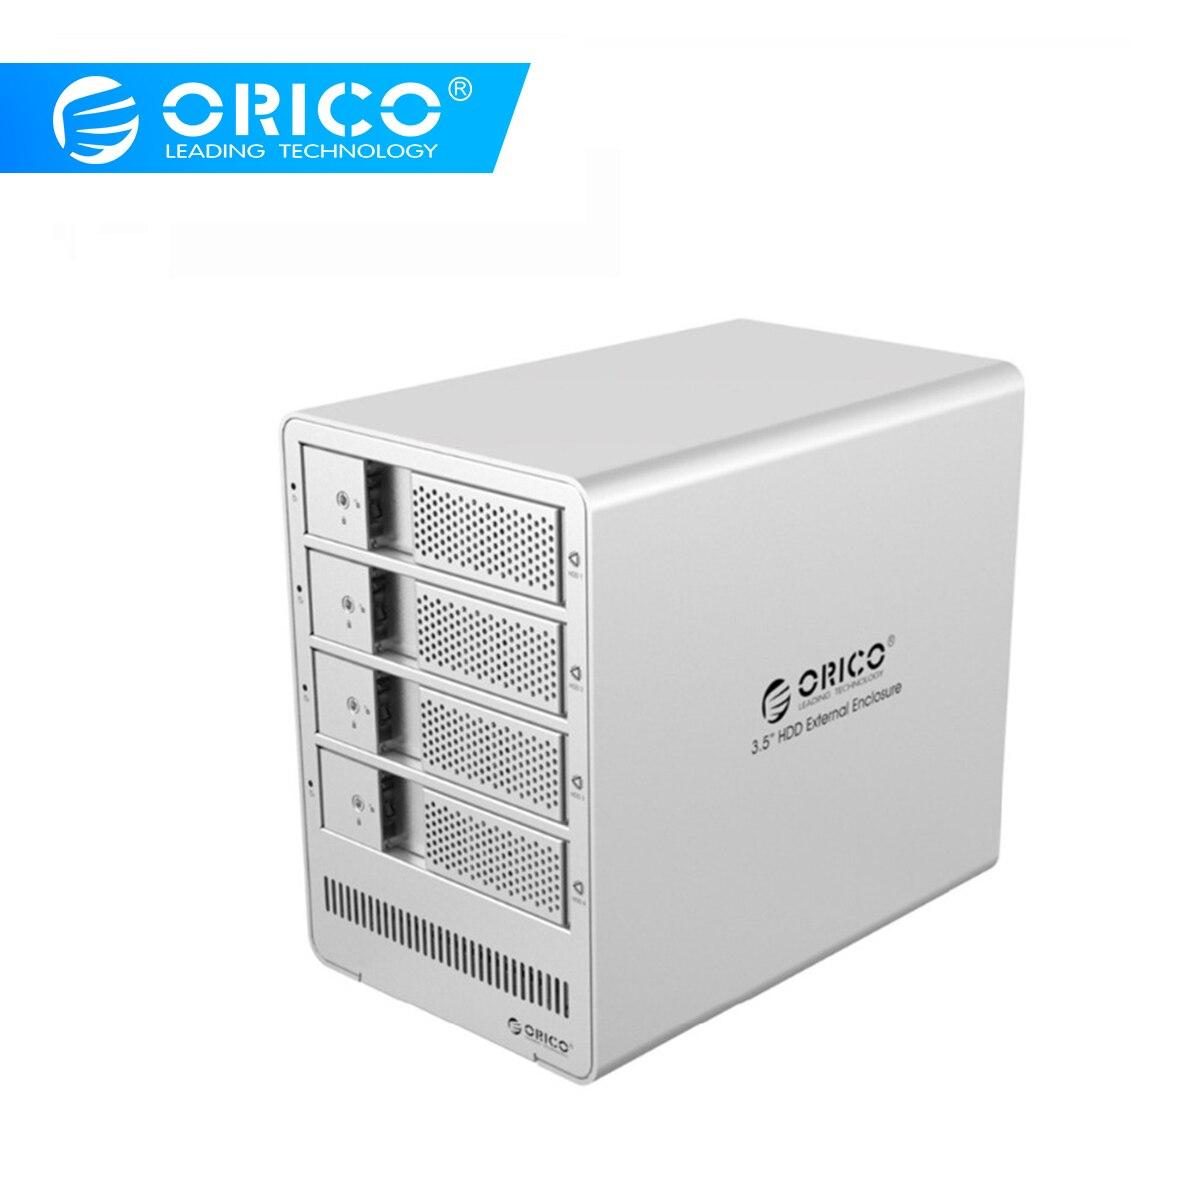 ORICO Tool Free  4 Bay 3.5